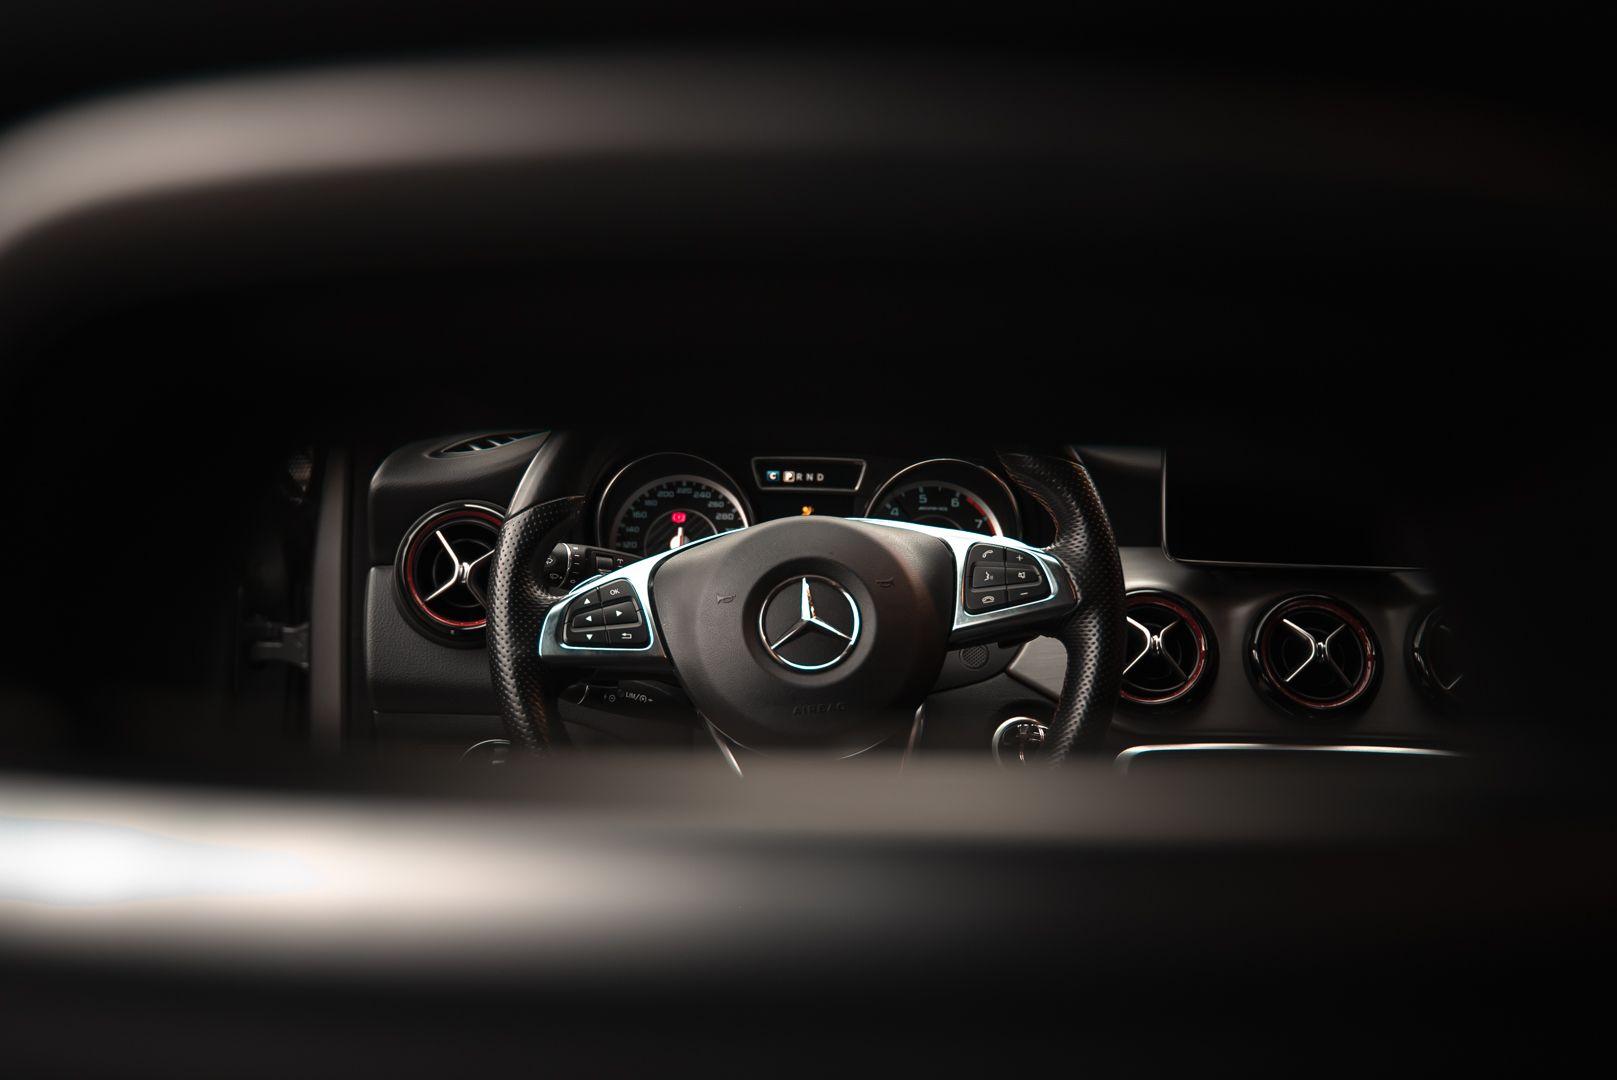 2015 Mercedes-Benz GLA AMG 45 68310